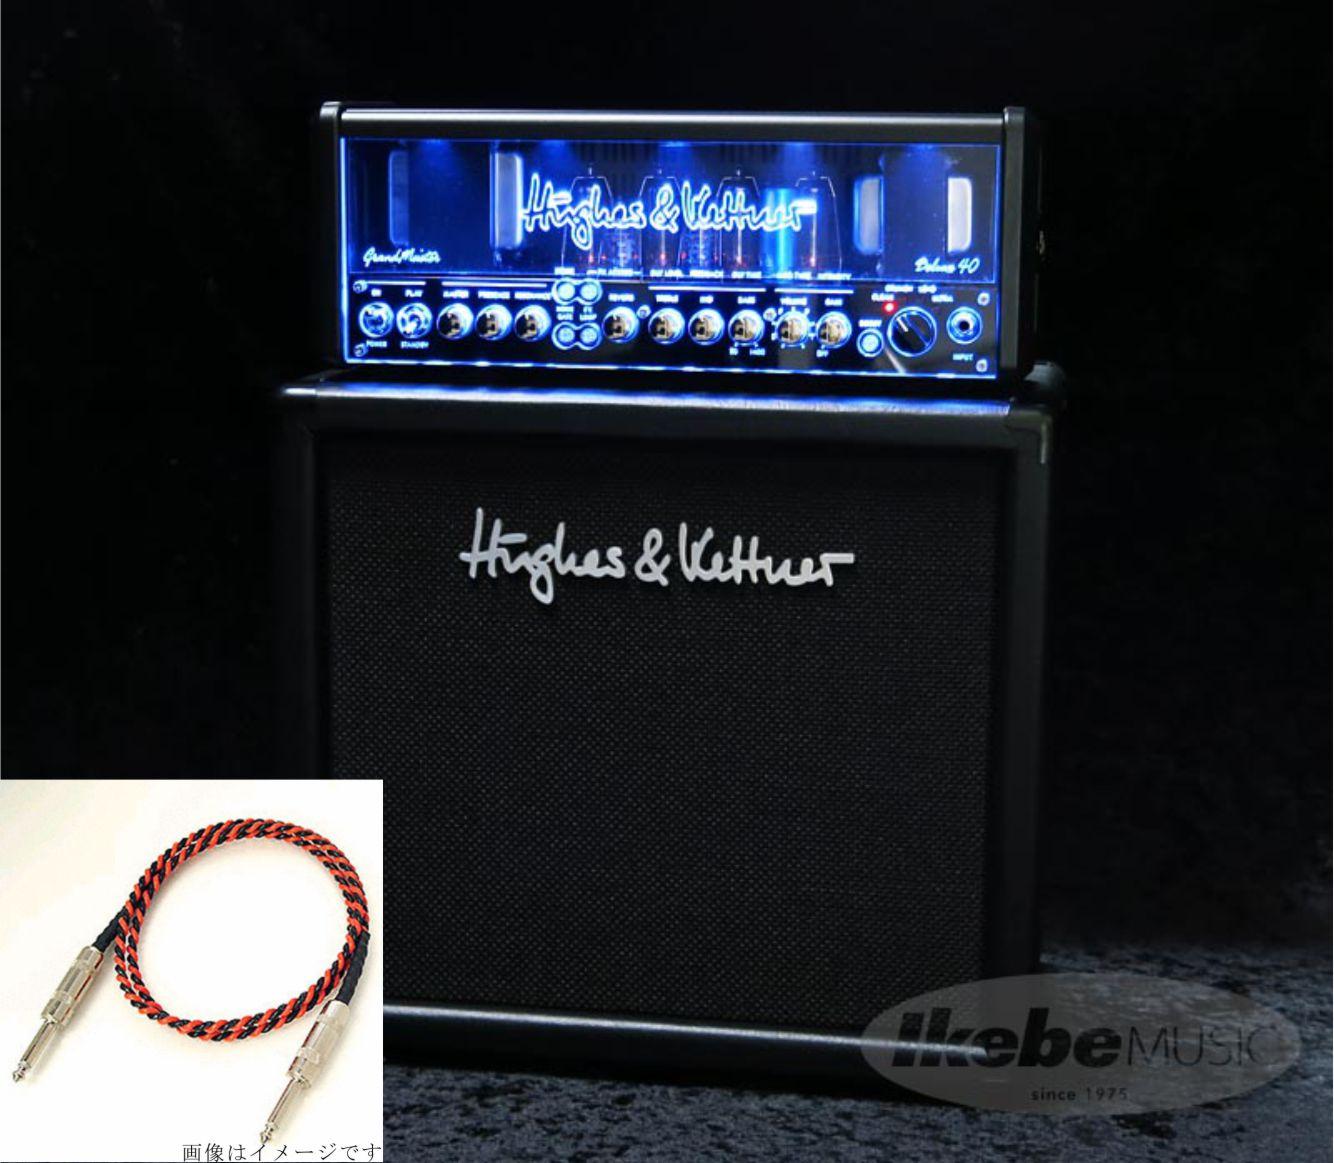 Hughes&Kettner 《ヒュース&ケトナー》GrandMeister Deluxe 40 & TubeMeister 112 Cabinet【数量限定ロゴ入りTシャツプレゼント!】Belden 9497ケーブル・プレゼント【送料無料!】